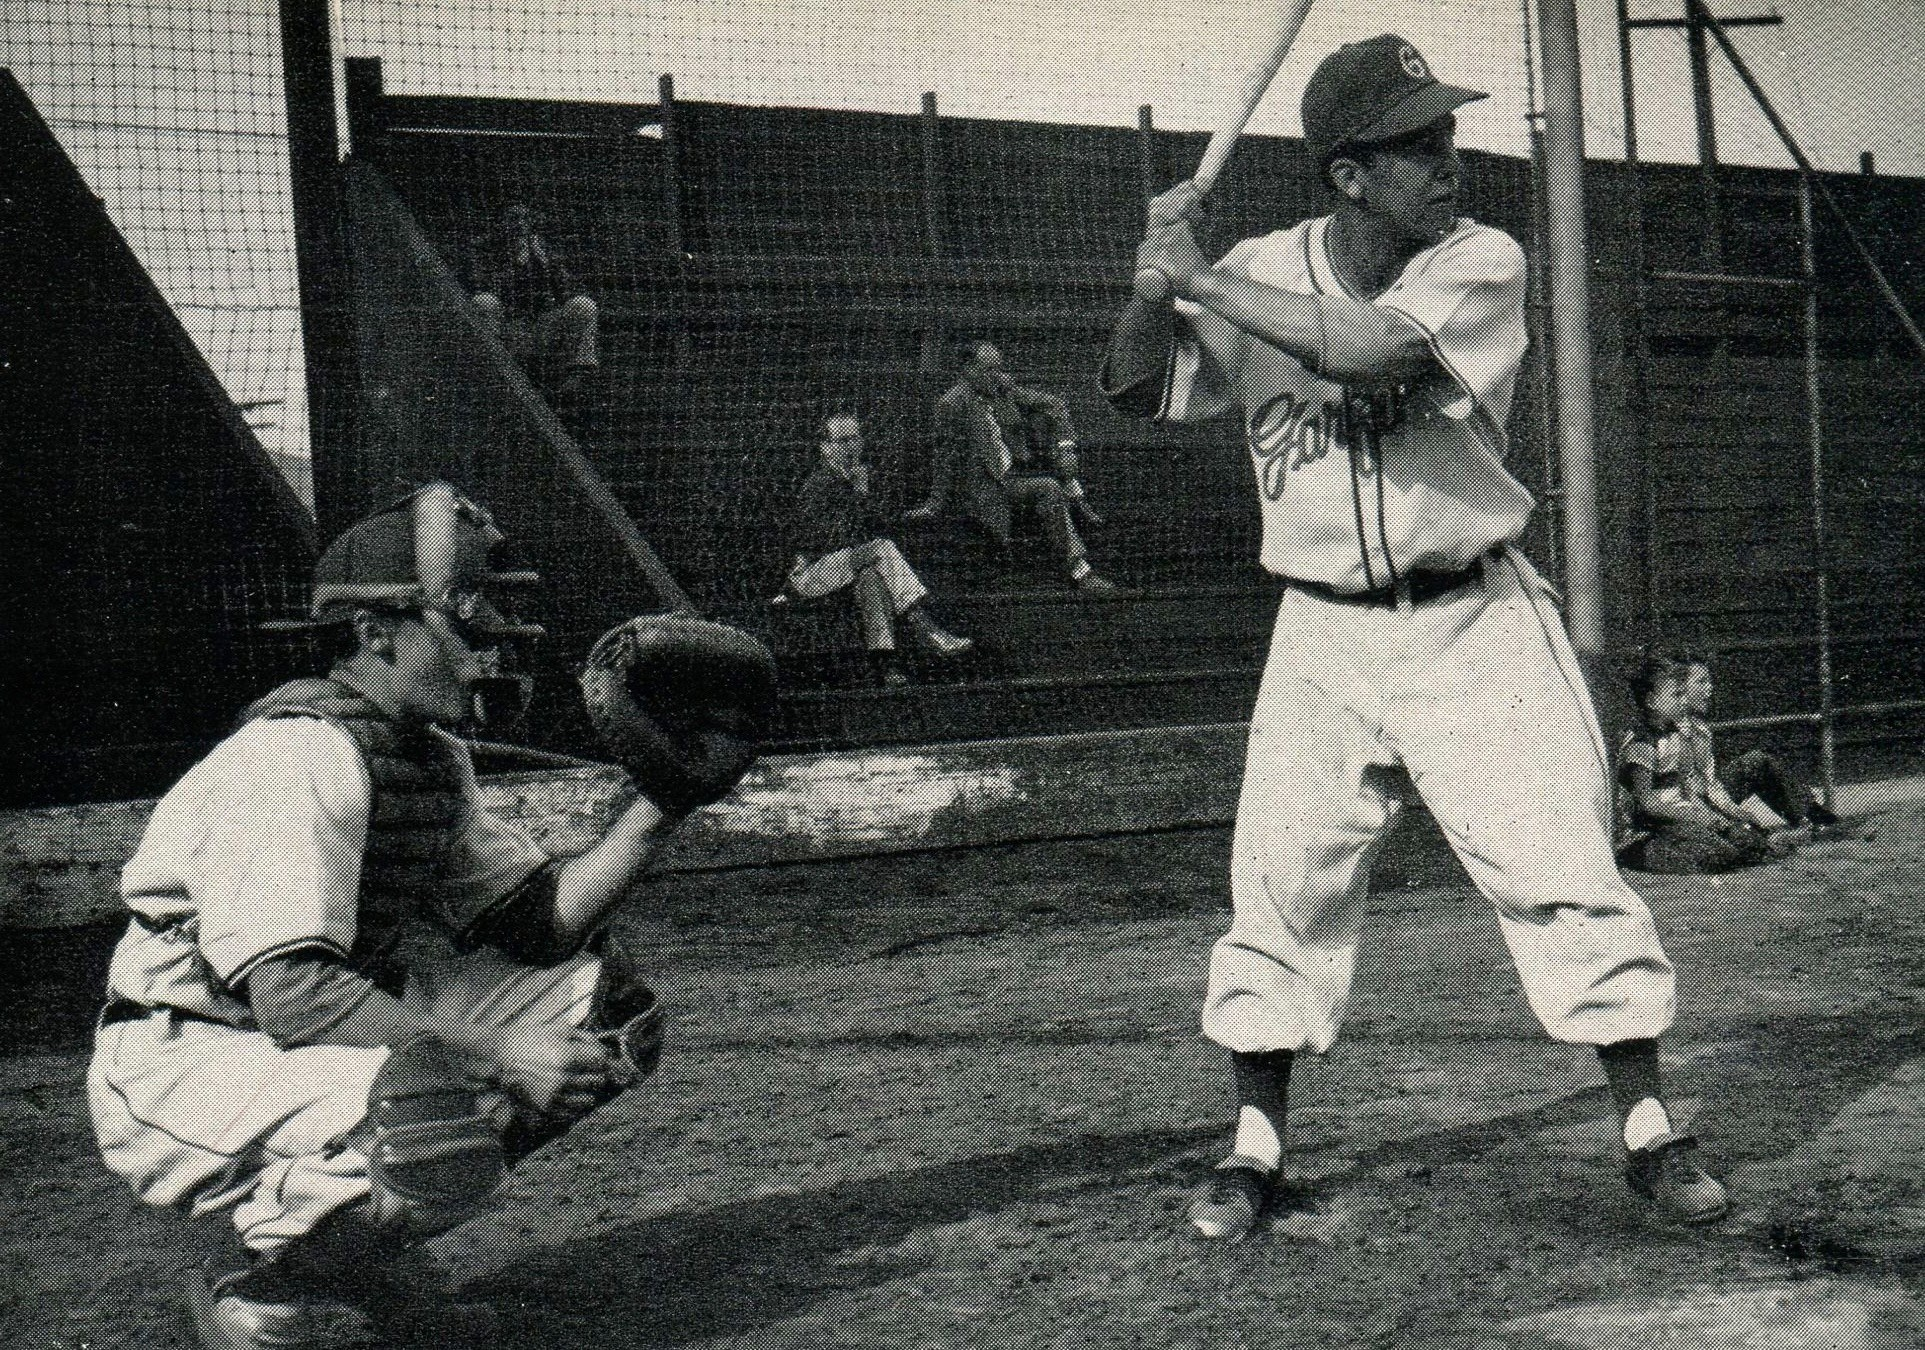 garfield baseball